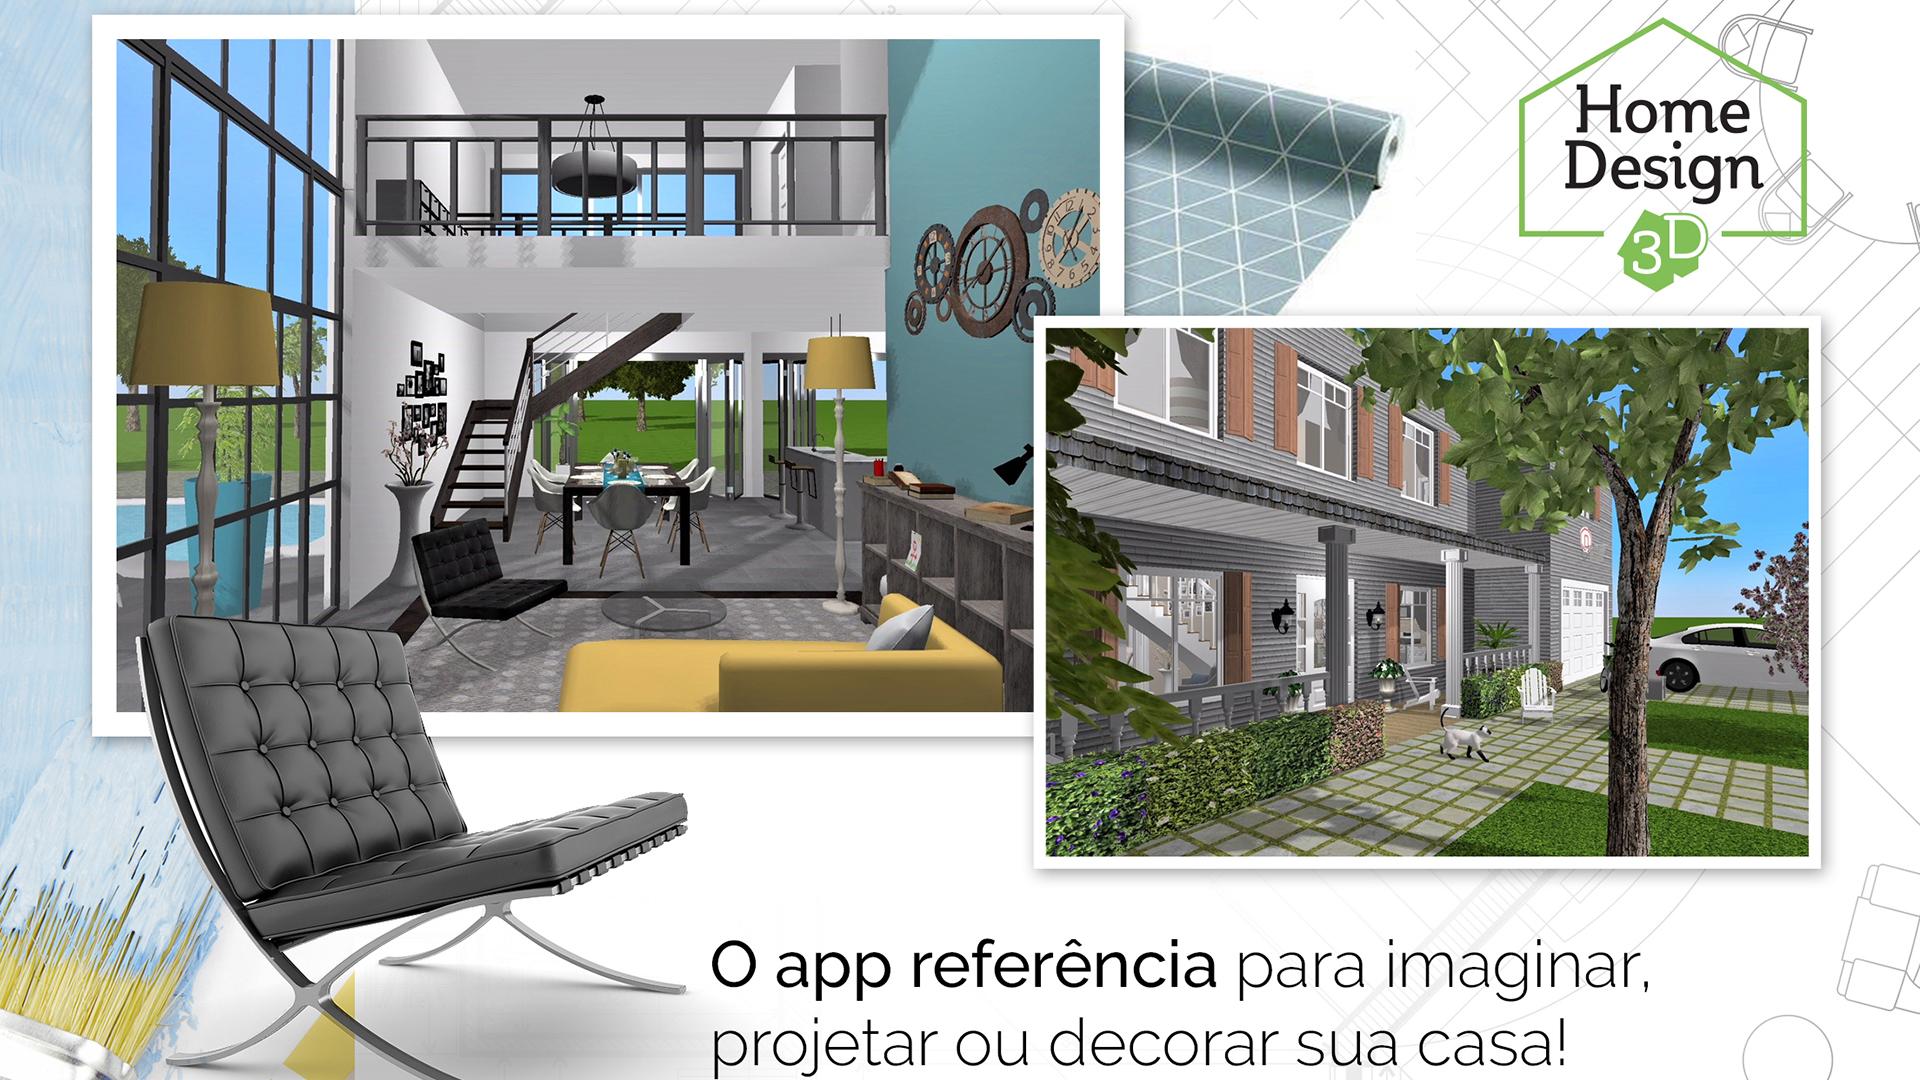 Home Design 3D - Free: Amazon.com.br: Amazon Appstore